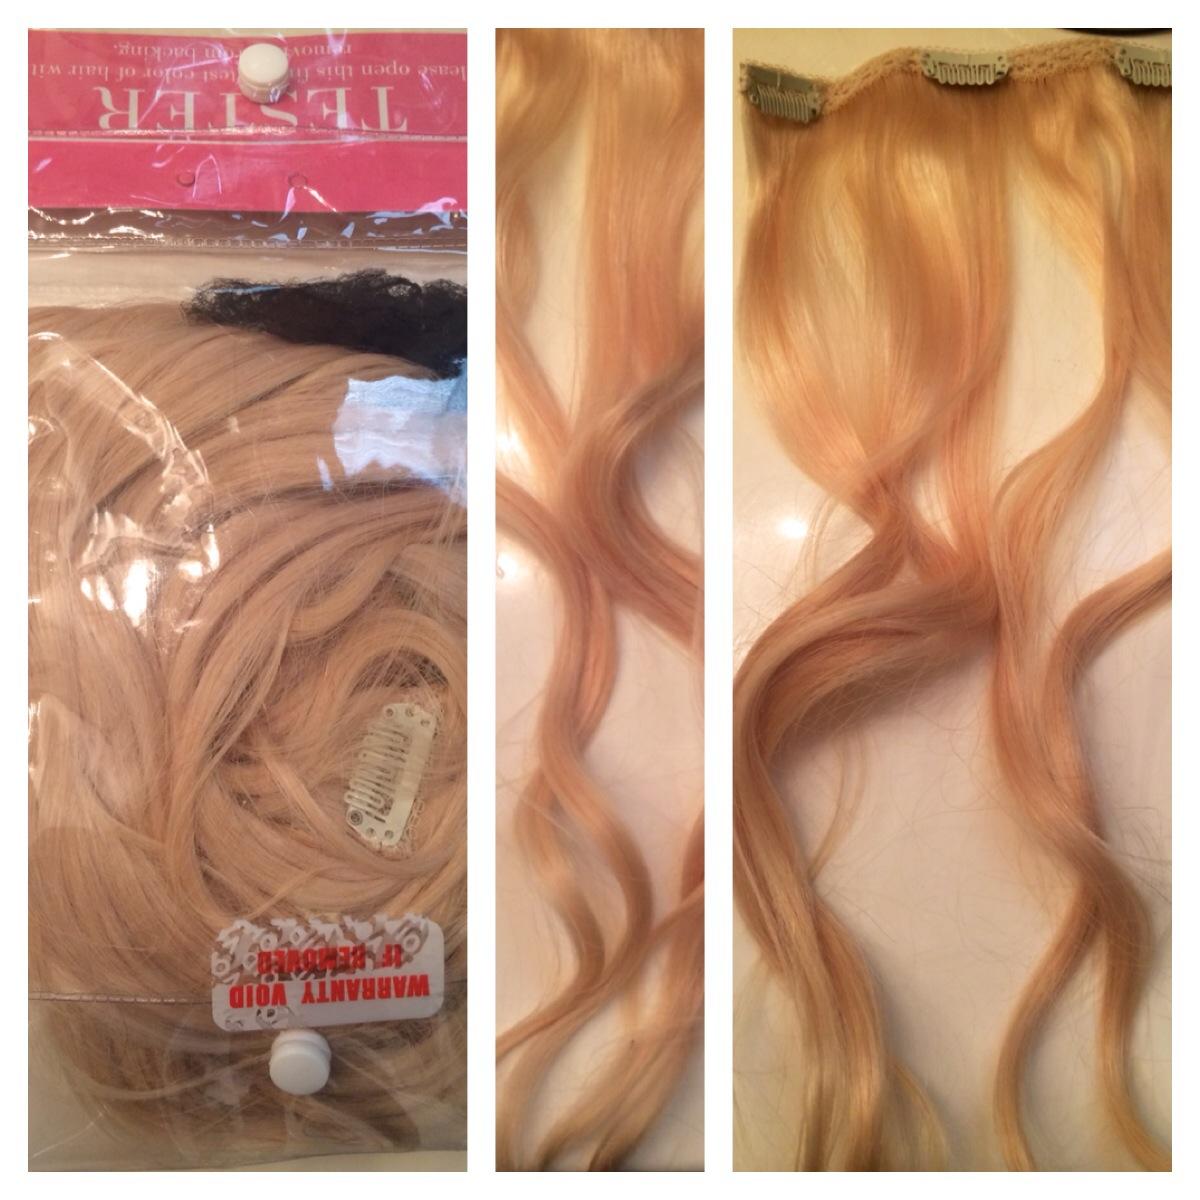 Bellami Hair Extensions Jfk Days